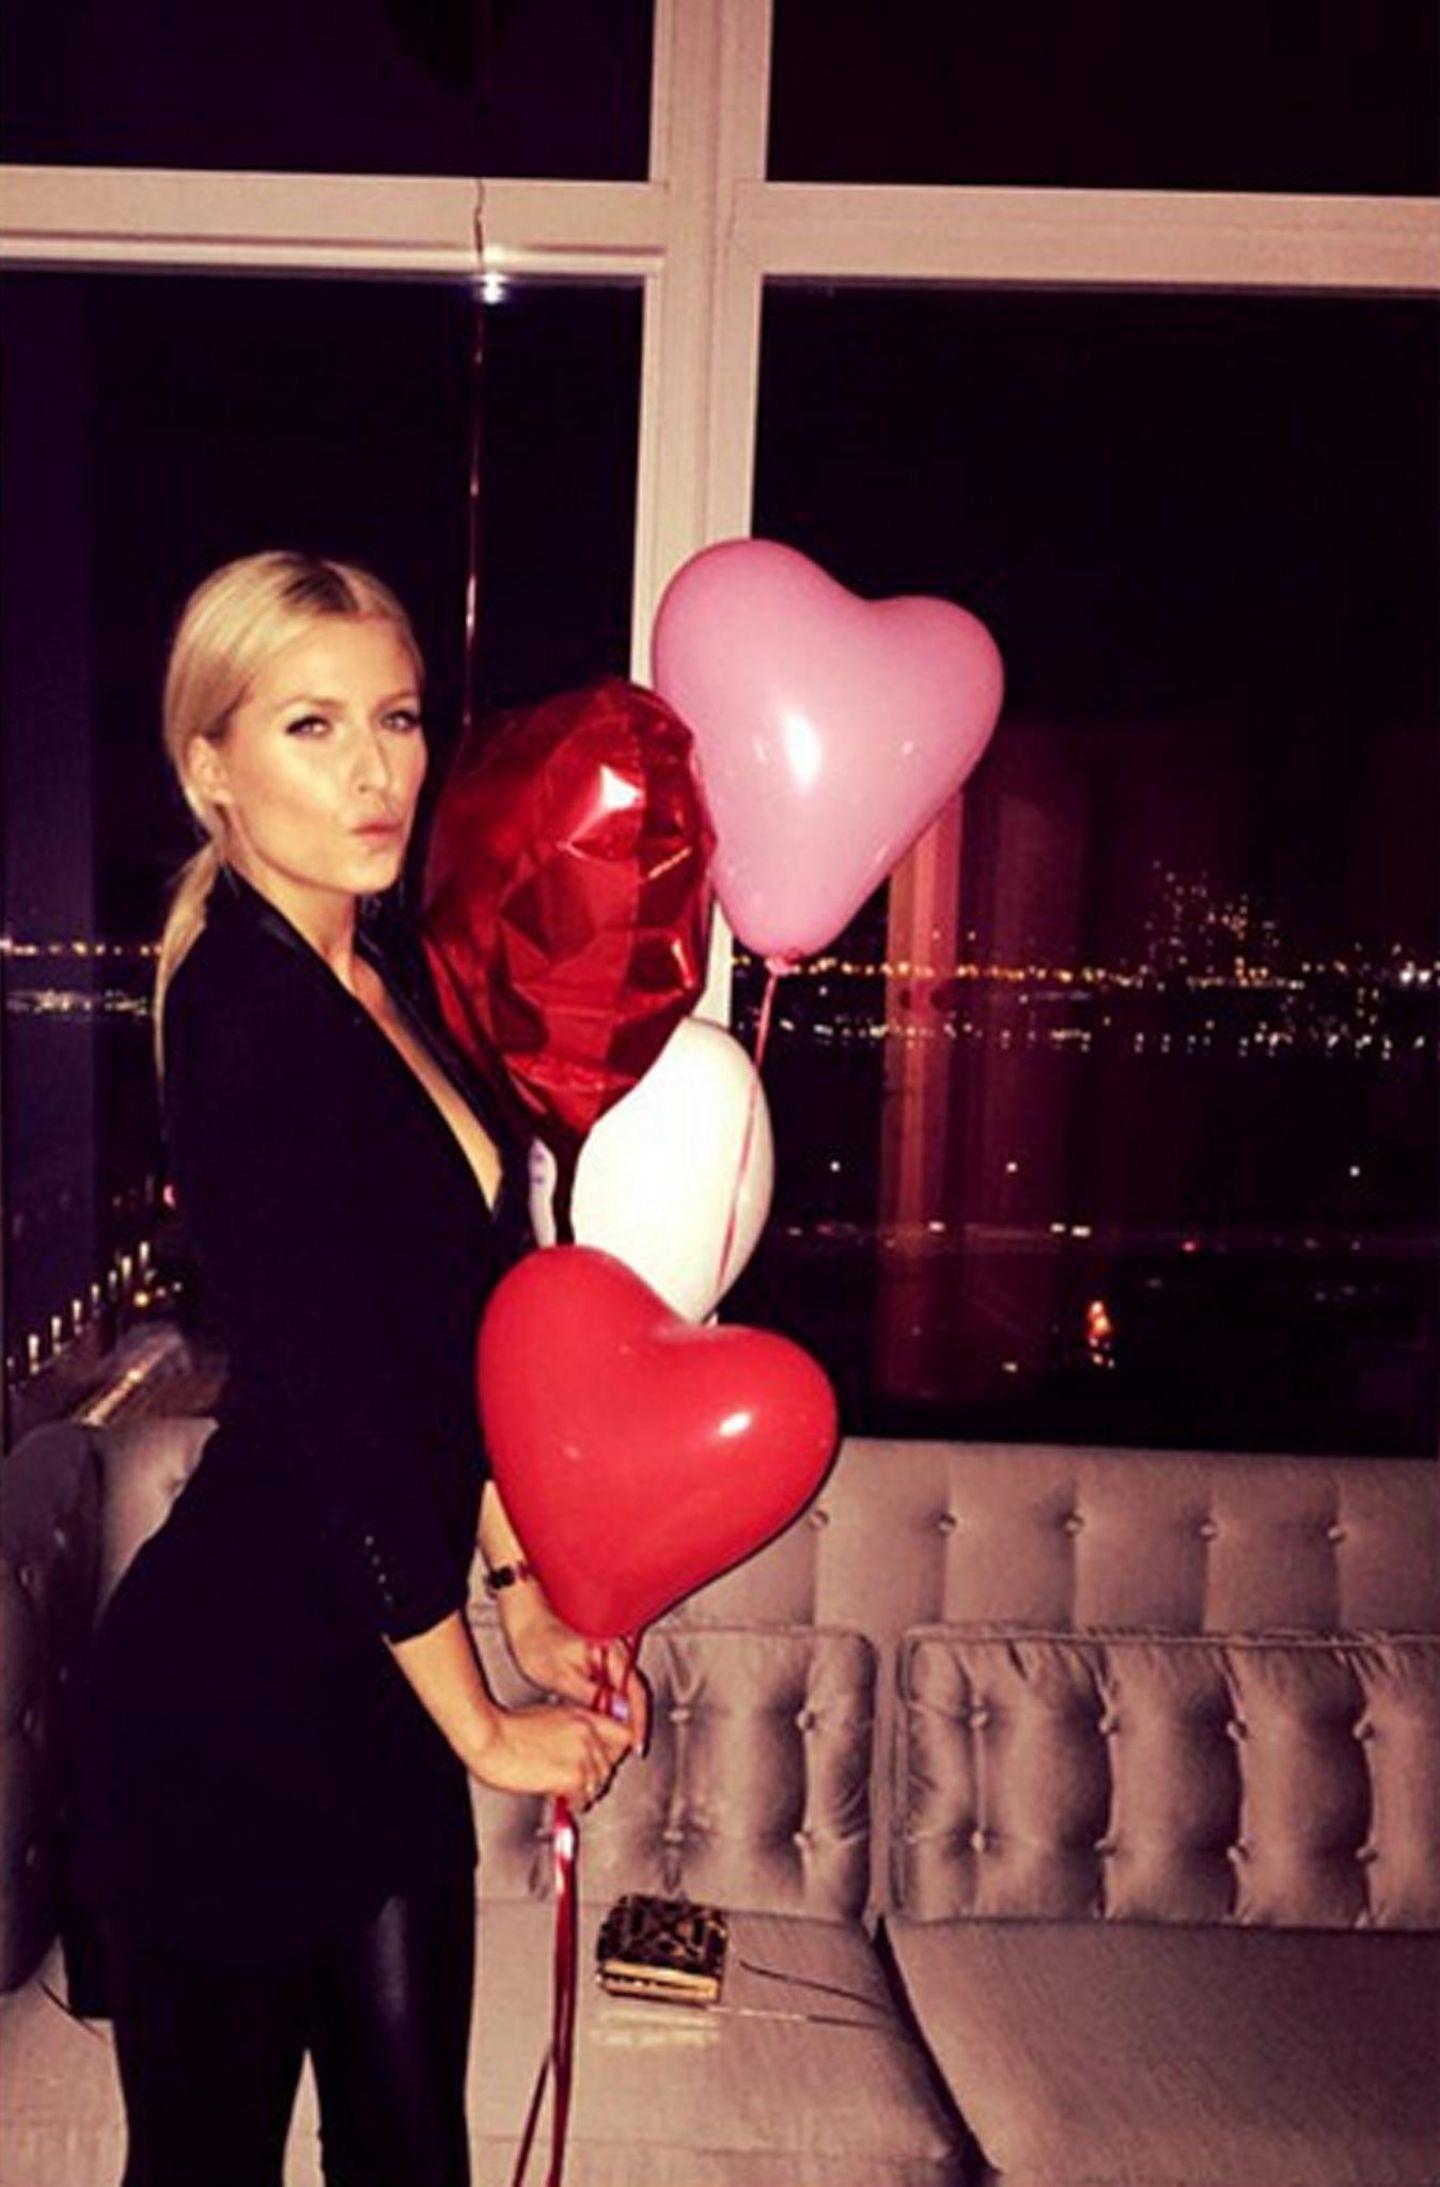 Bei Lena Gercke gibt's statt Blumen Luftballons in Herzform.